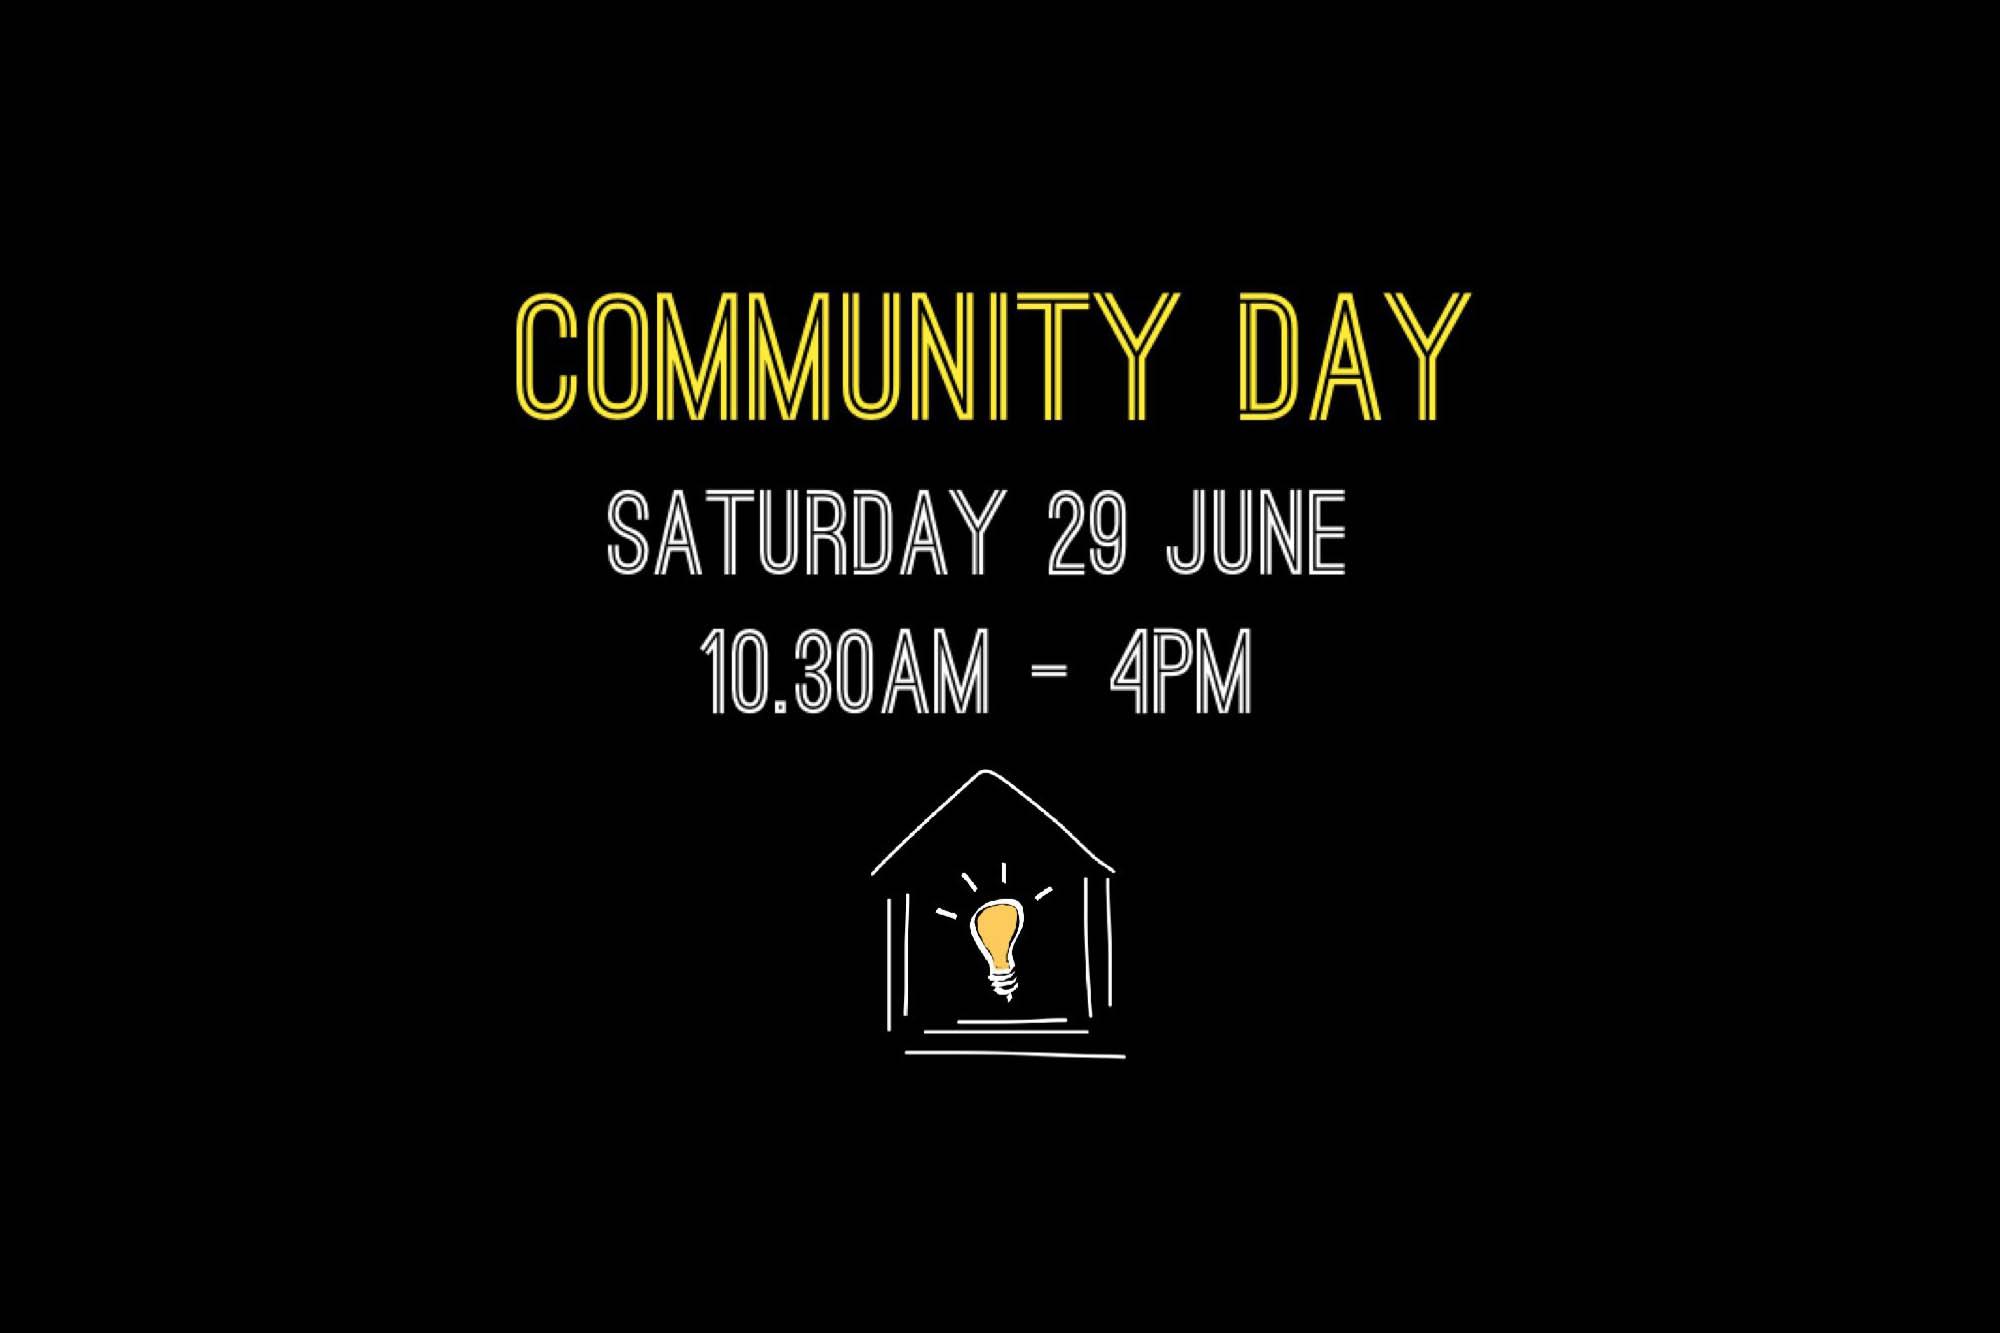 communityday1.jpg